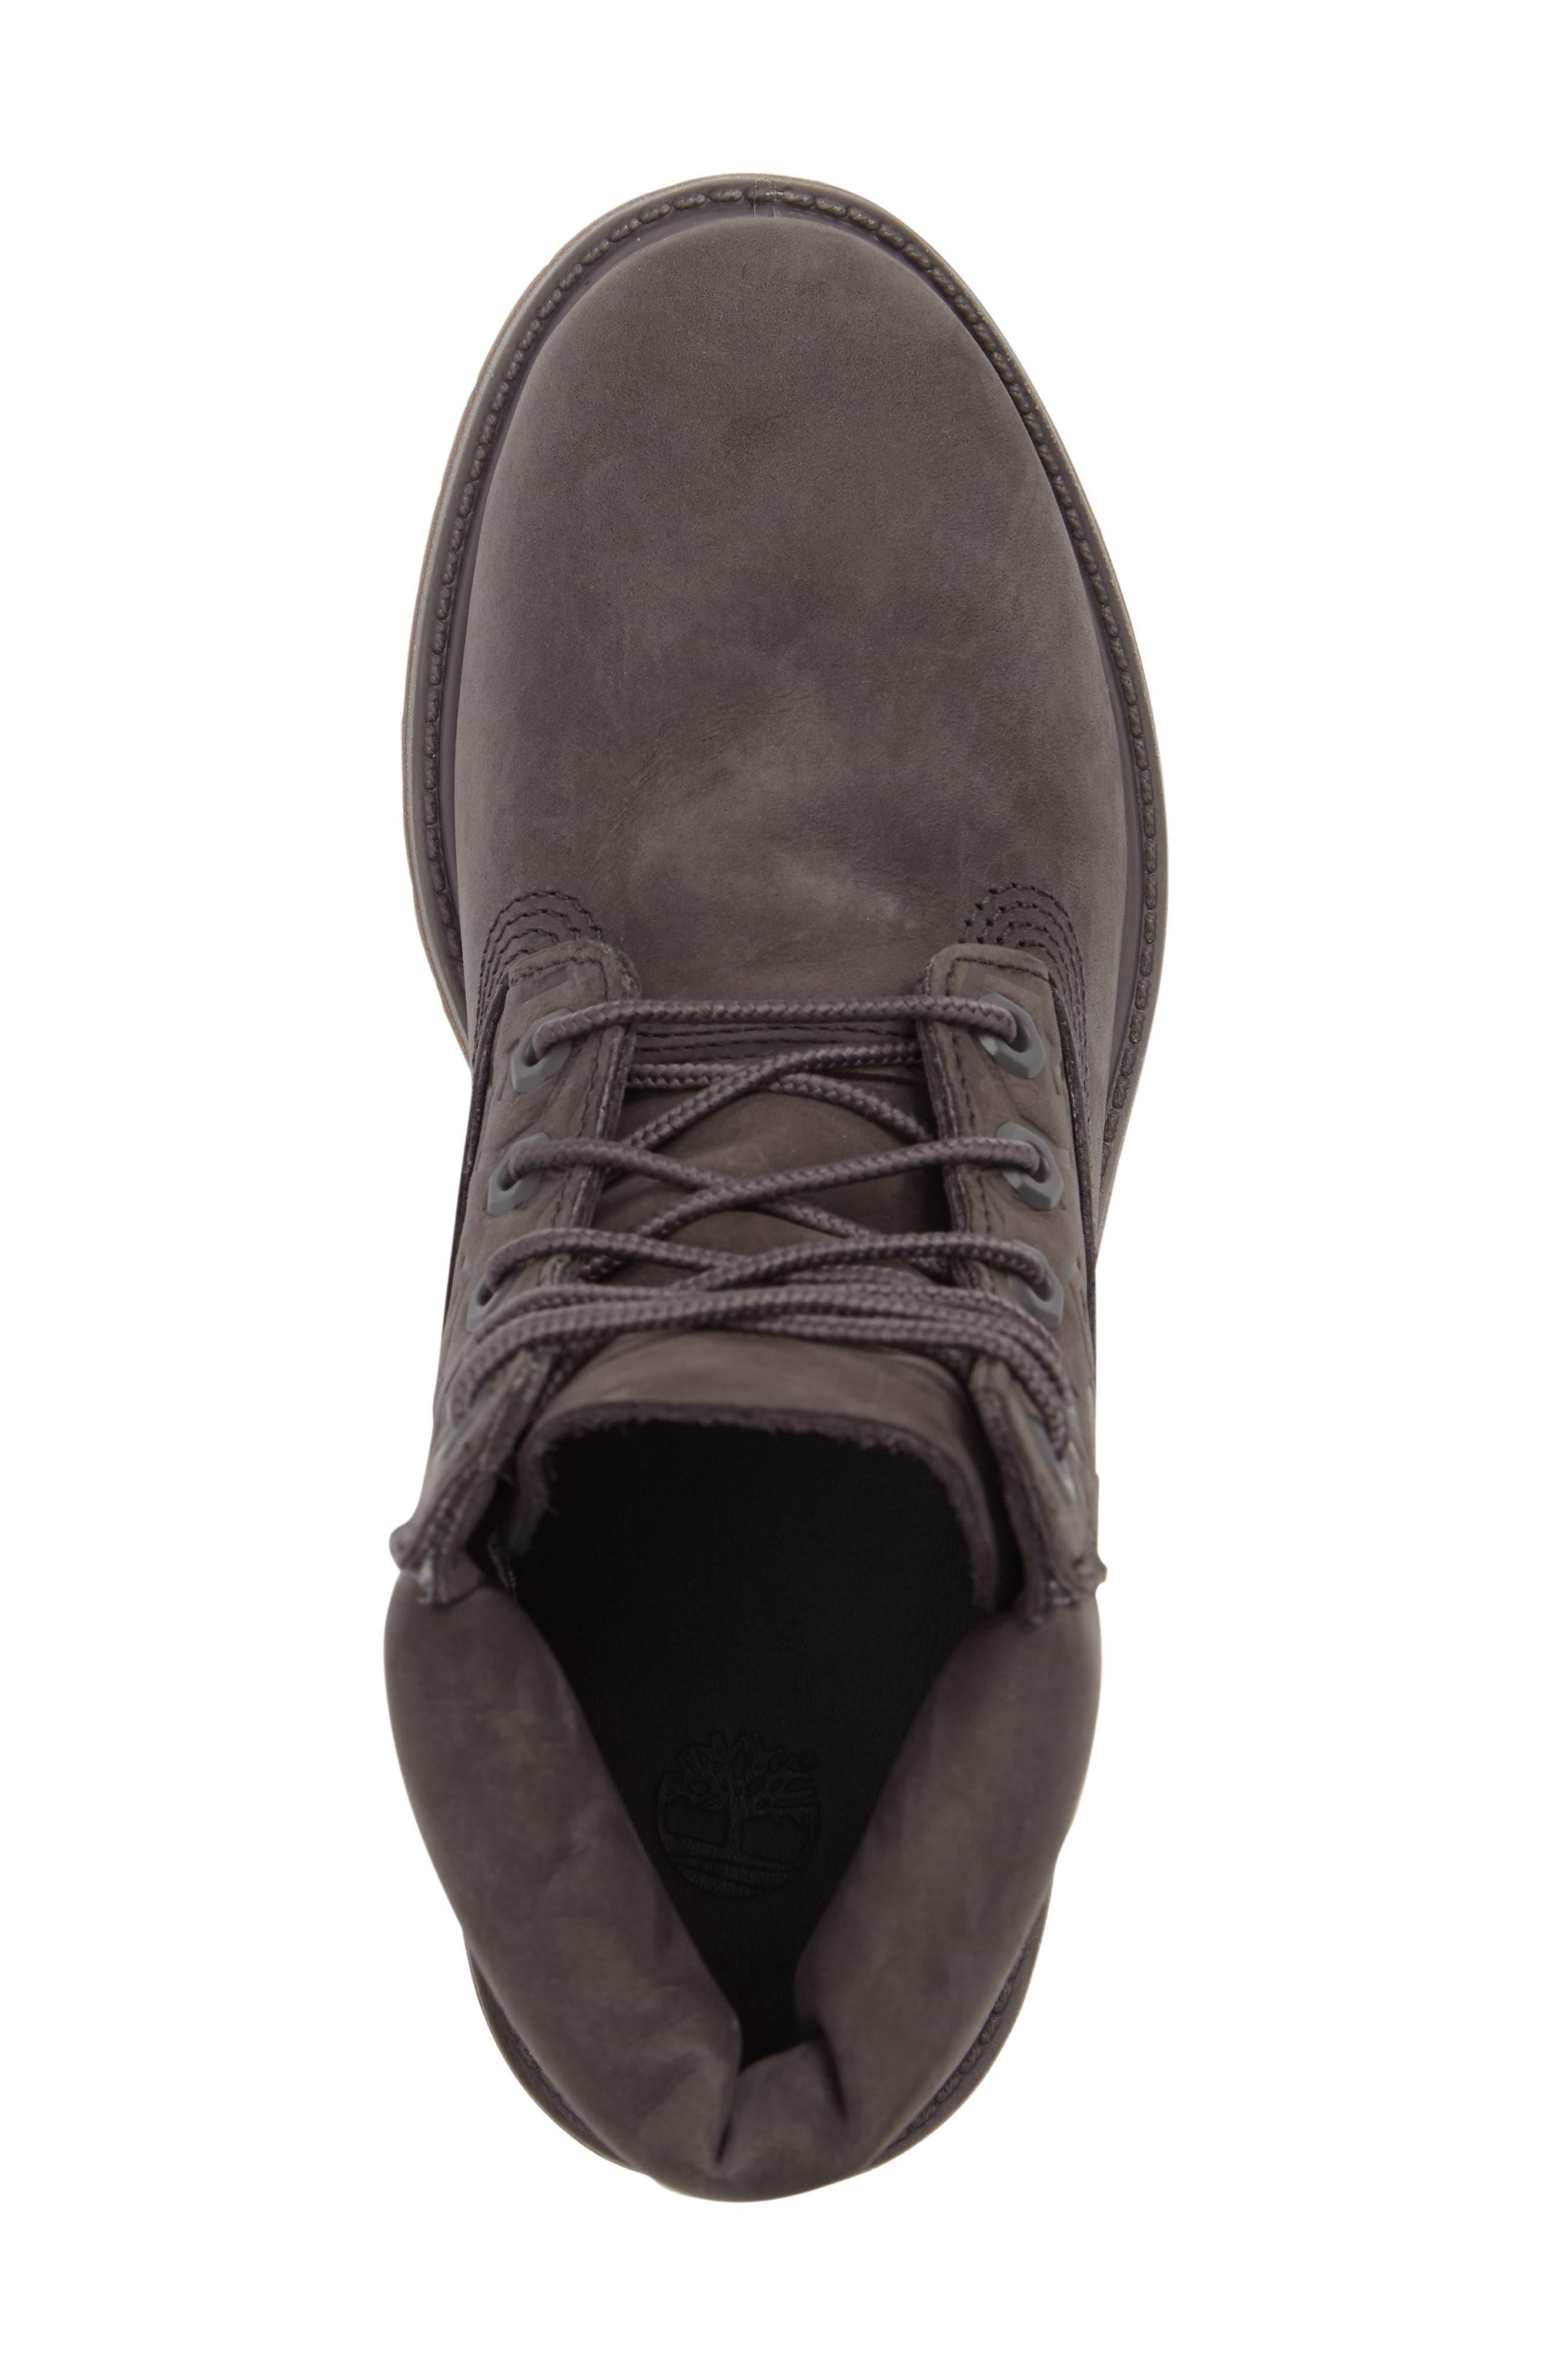 6-Inch Premium Embossed Waterproof Boot,                             Alternate thumbnail 5, color,                             021